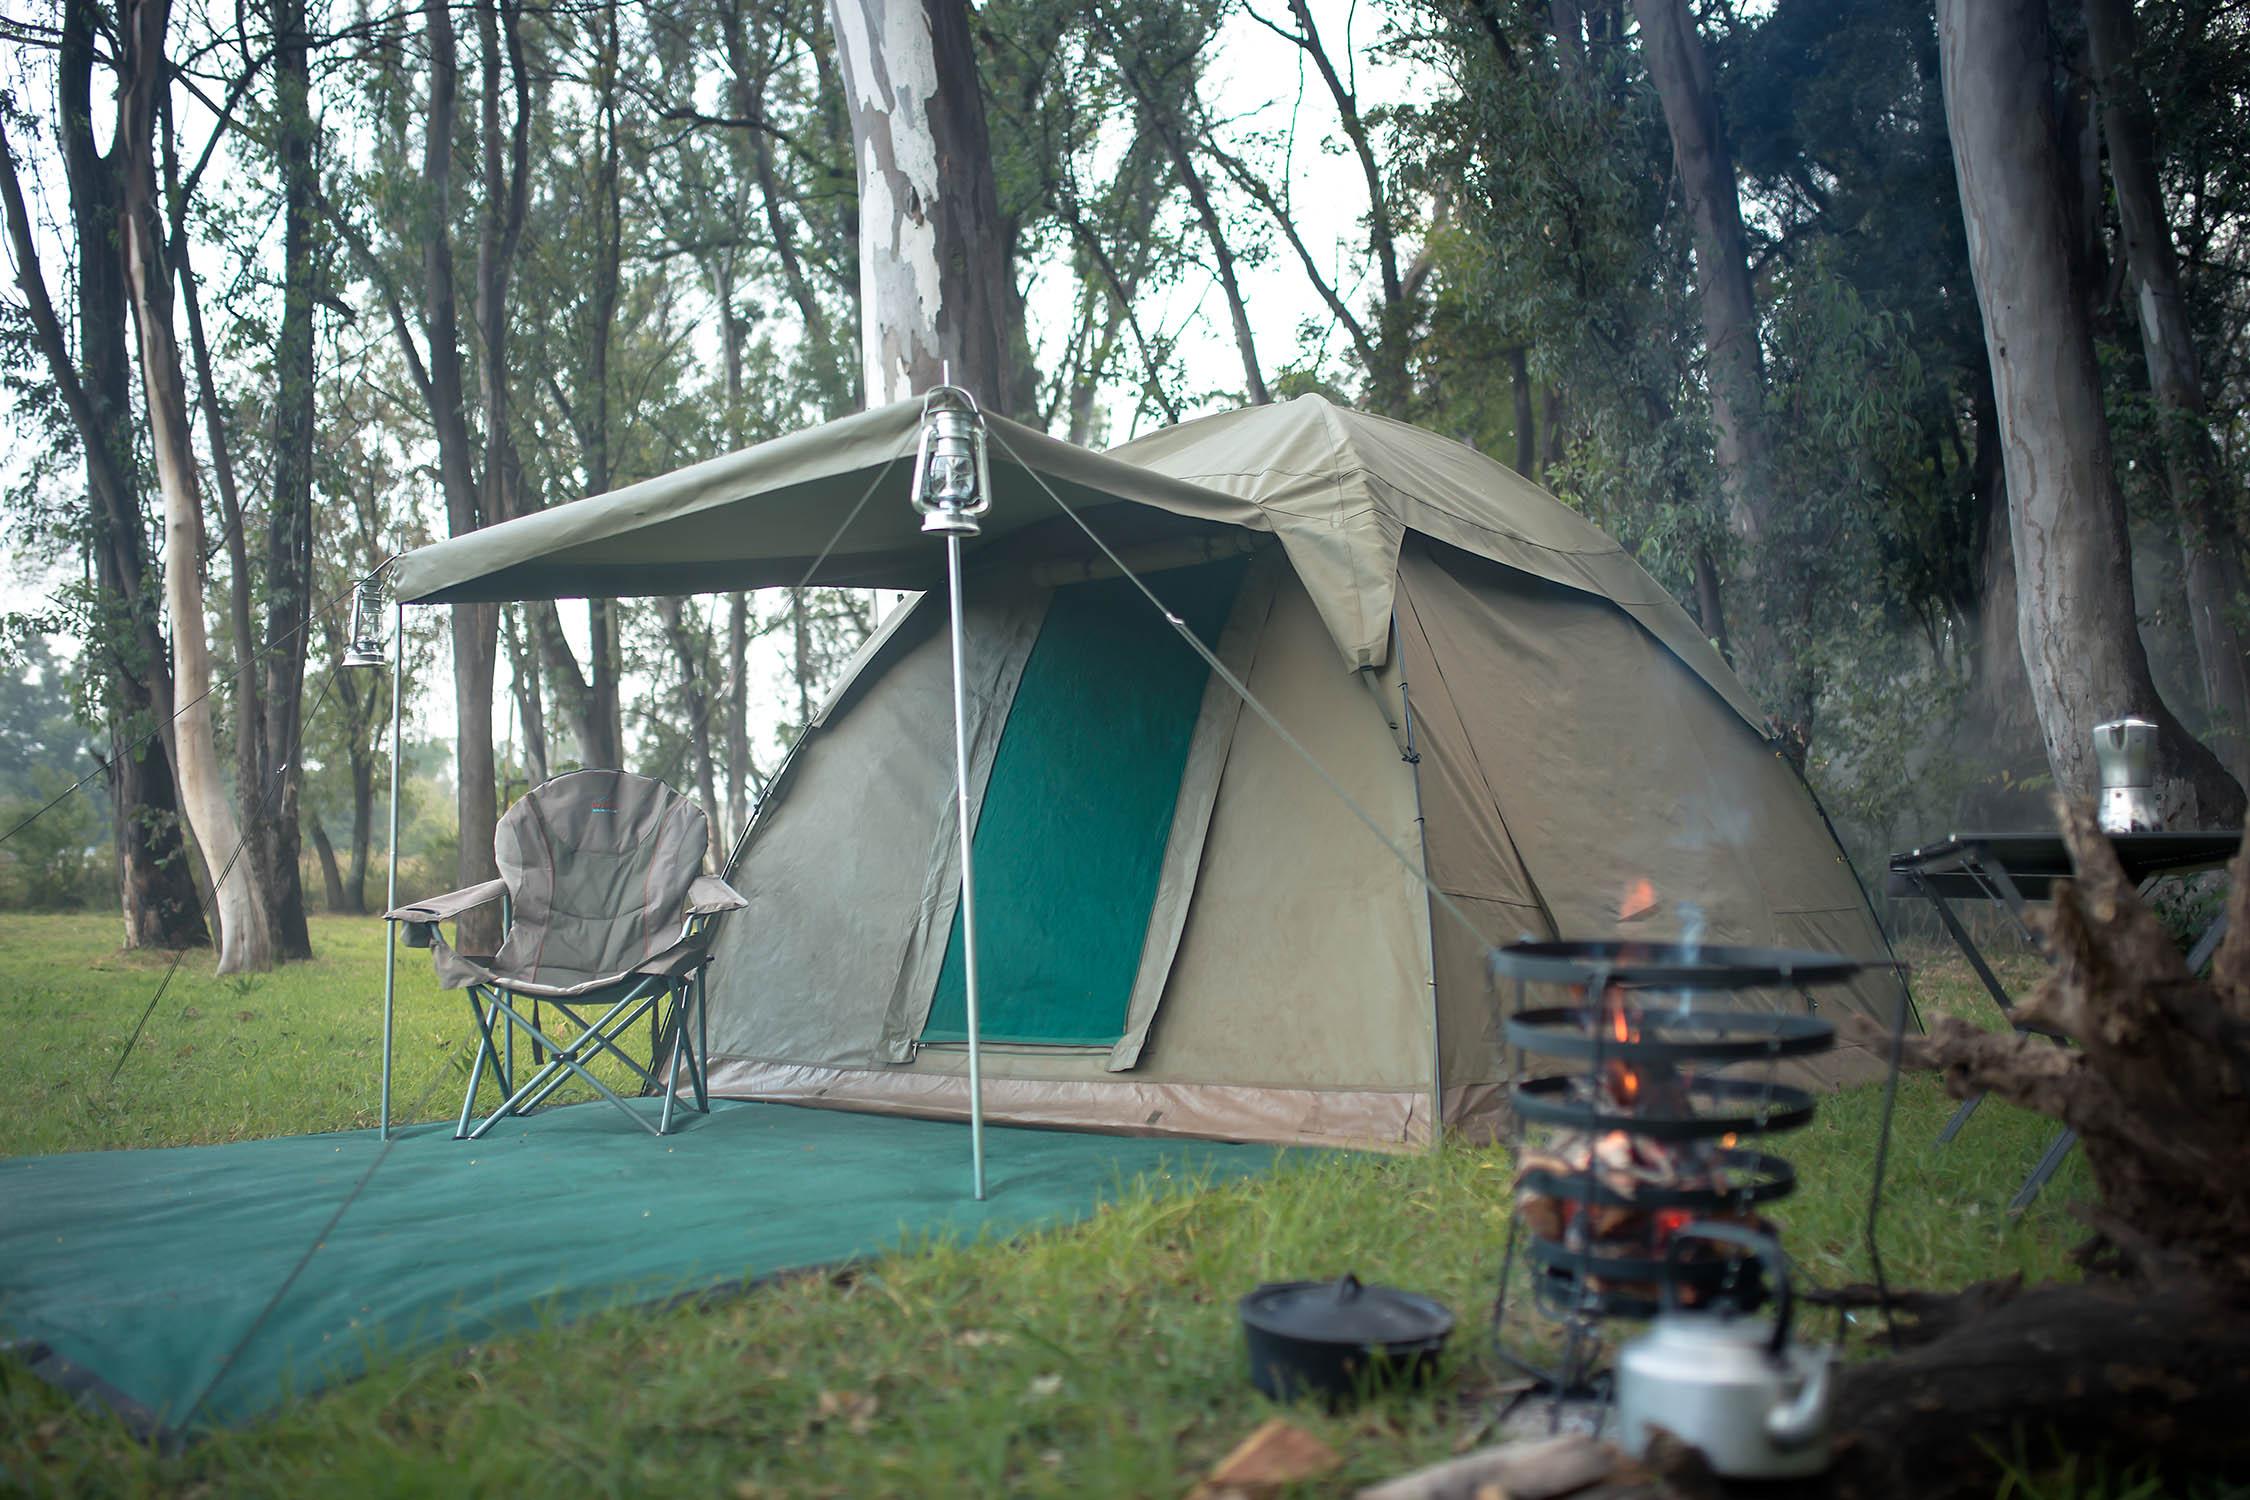 Alpha Kilo 4000 187 Bushtec Adventure